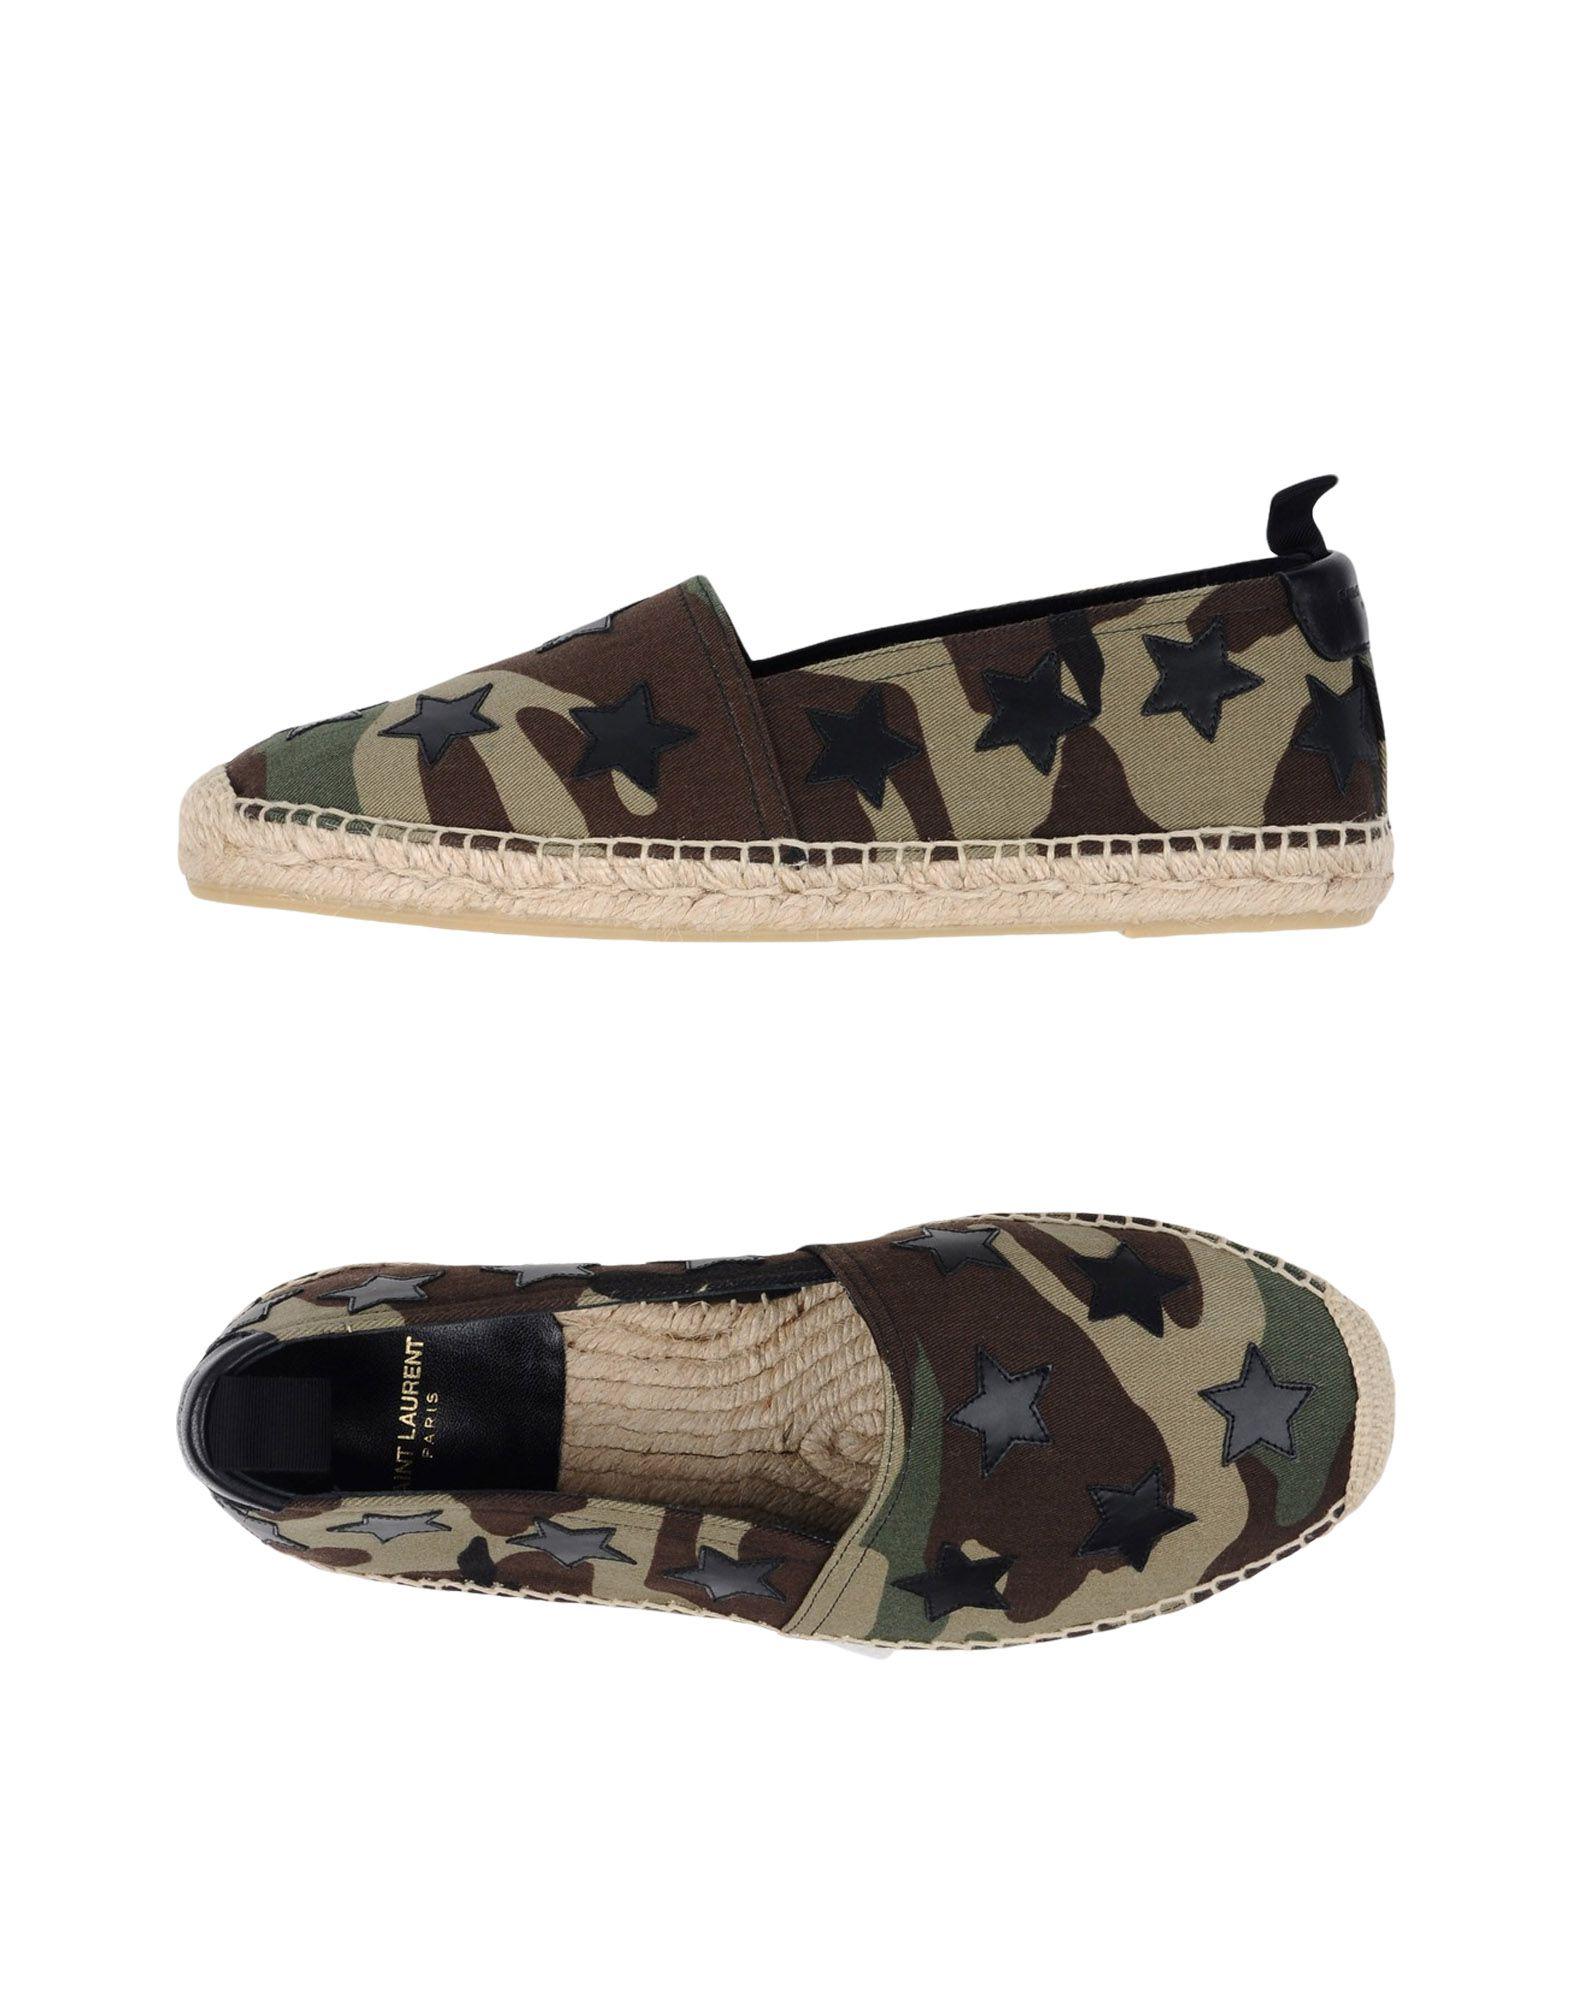 Saint Laurent Espadrilles Herren  11365397CQ Gute Qualität beliebte Schuhe